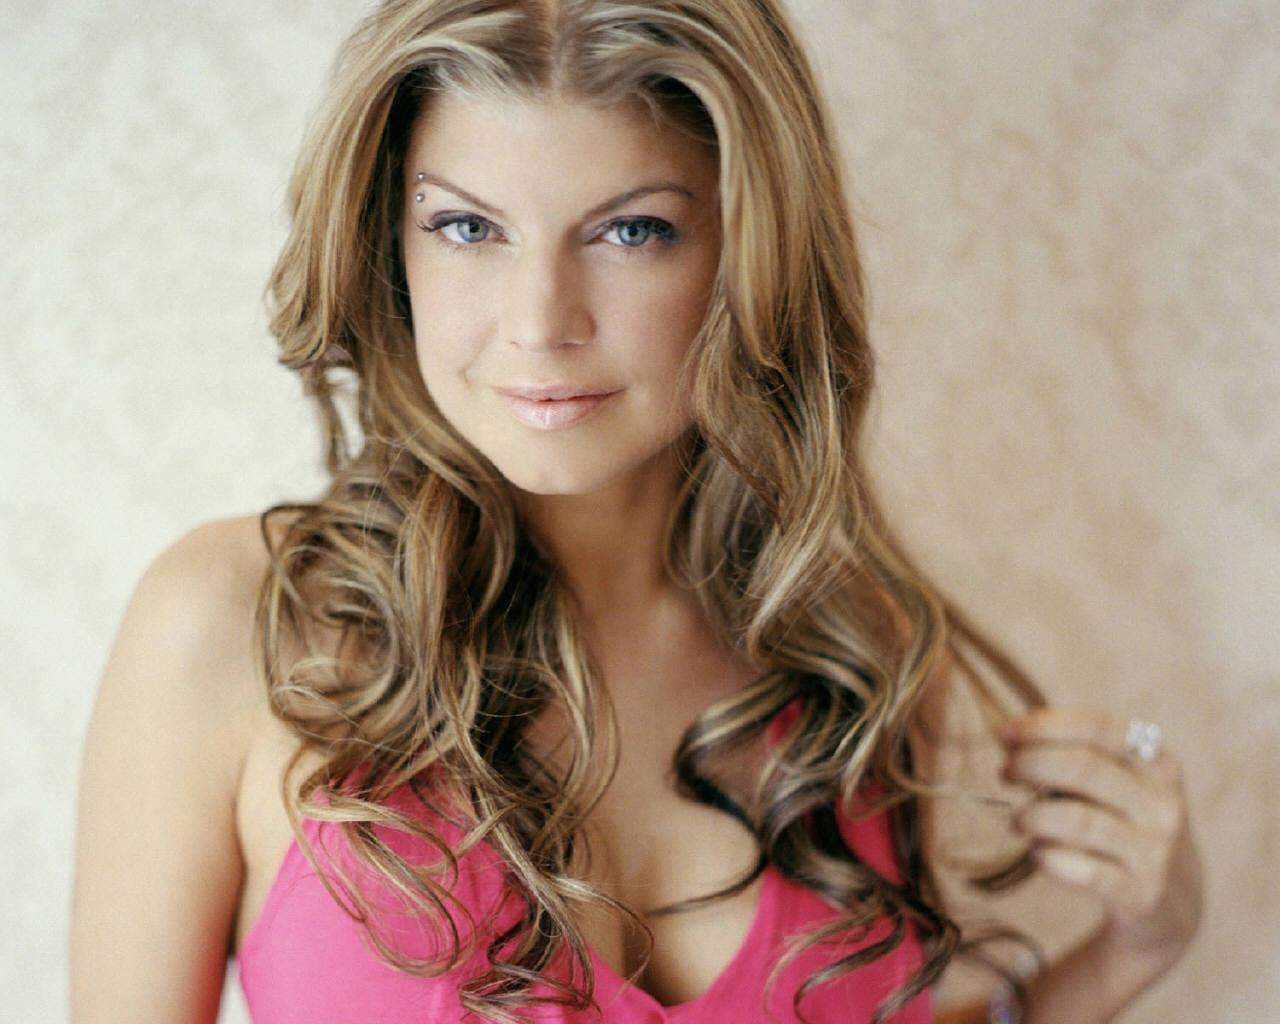 http://2.bp.blogspot.com/-QE6Nk6DaA_g/TrQwoV9evtI/AAAAAAAAECY/frluNW3gg3A/s1600/fergie+hairstyles+%25282%2529.jpg